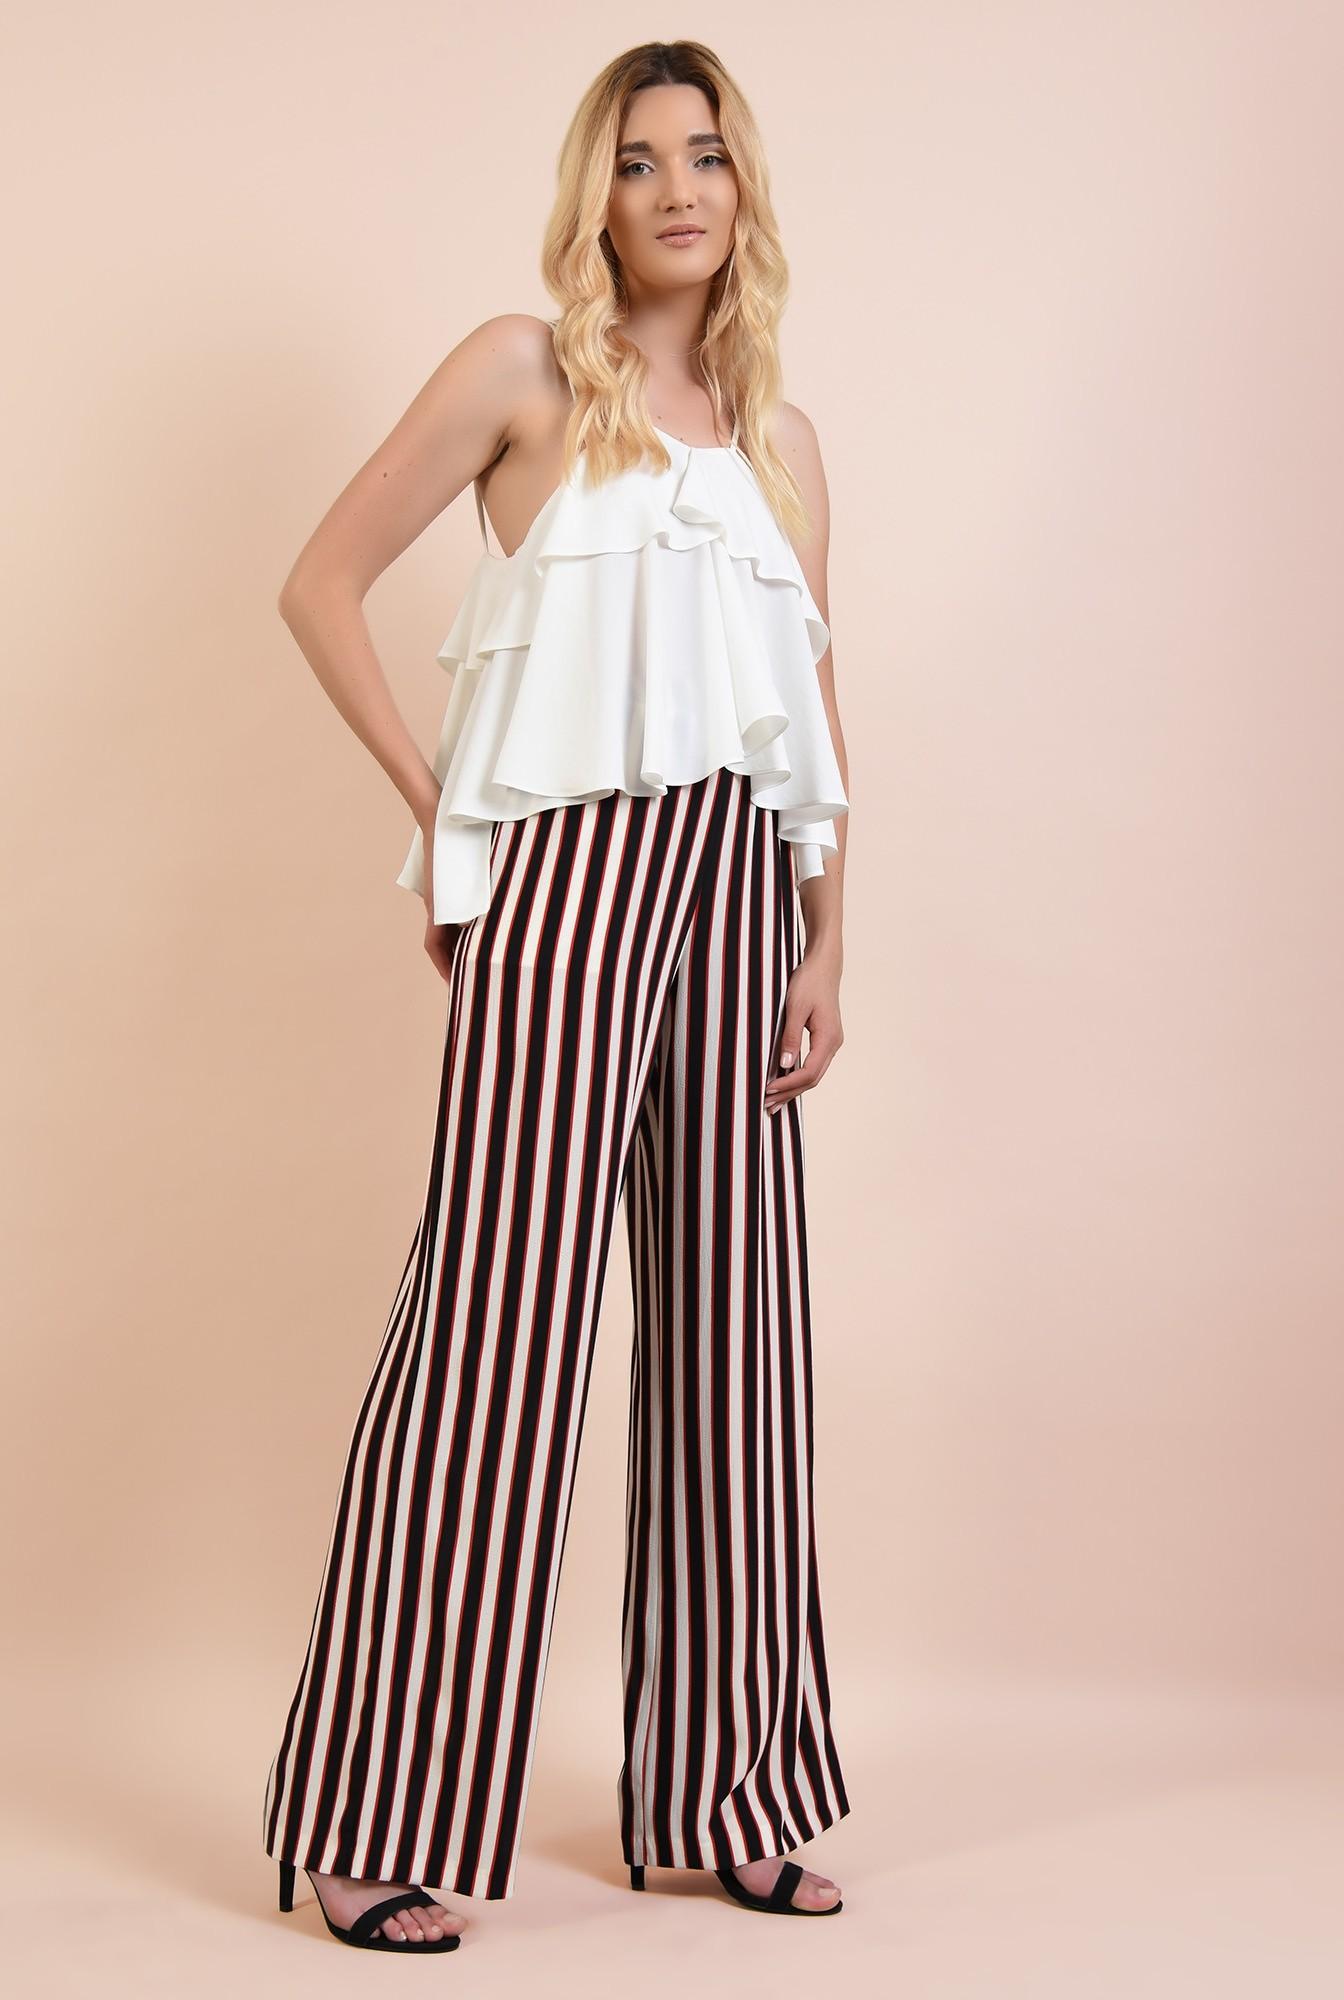 360 - pantaloni cu dungi, drepti, croi lejer, cu talie elastica, buzunare, Poema